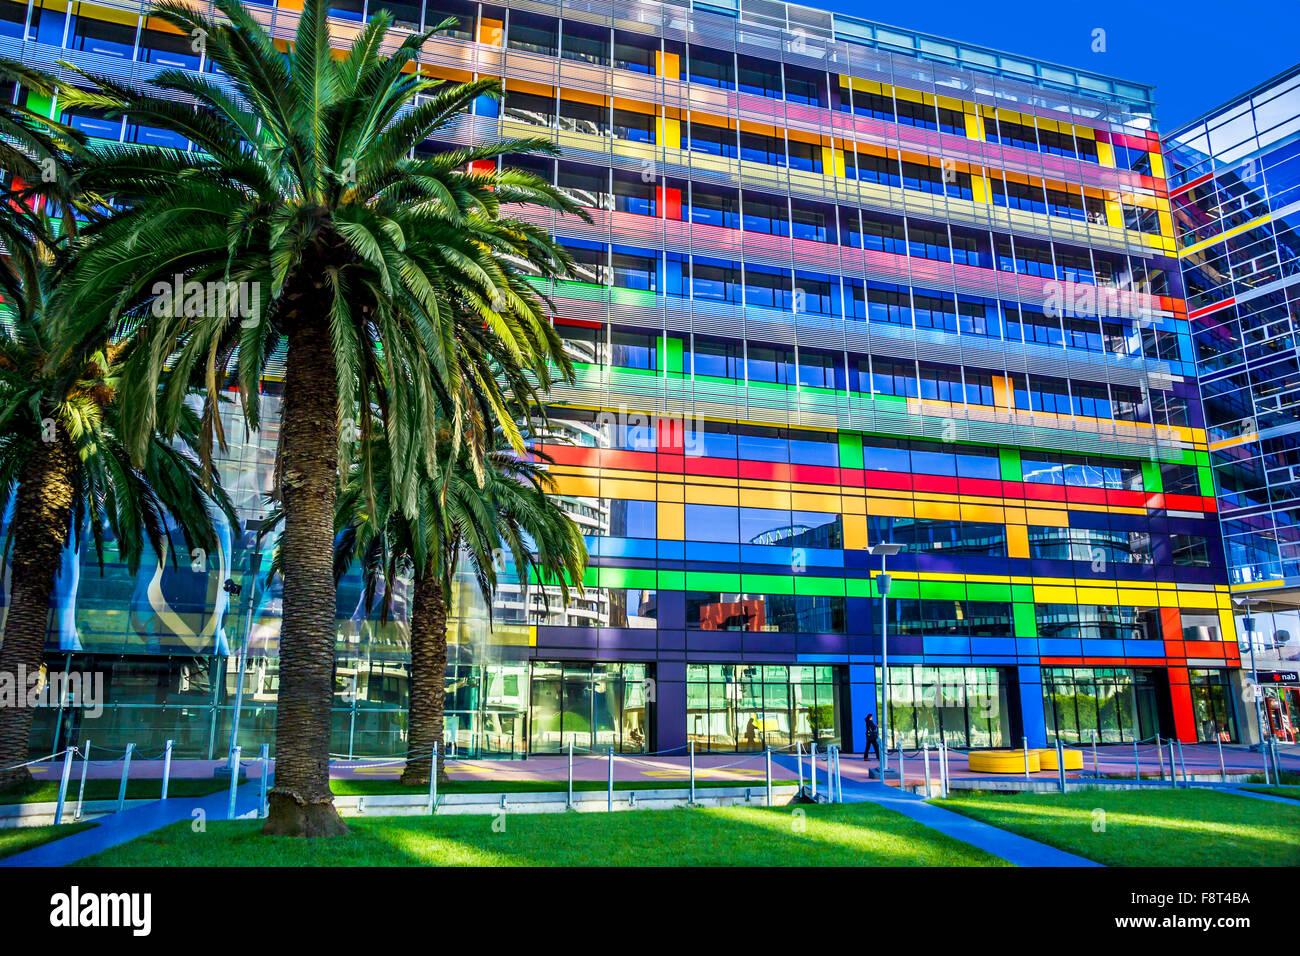 Contemporary architecture, Docklands Melbourne, Australia - Stock Image